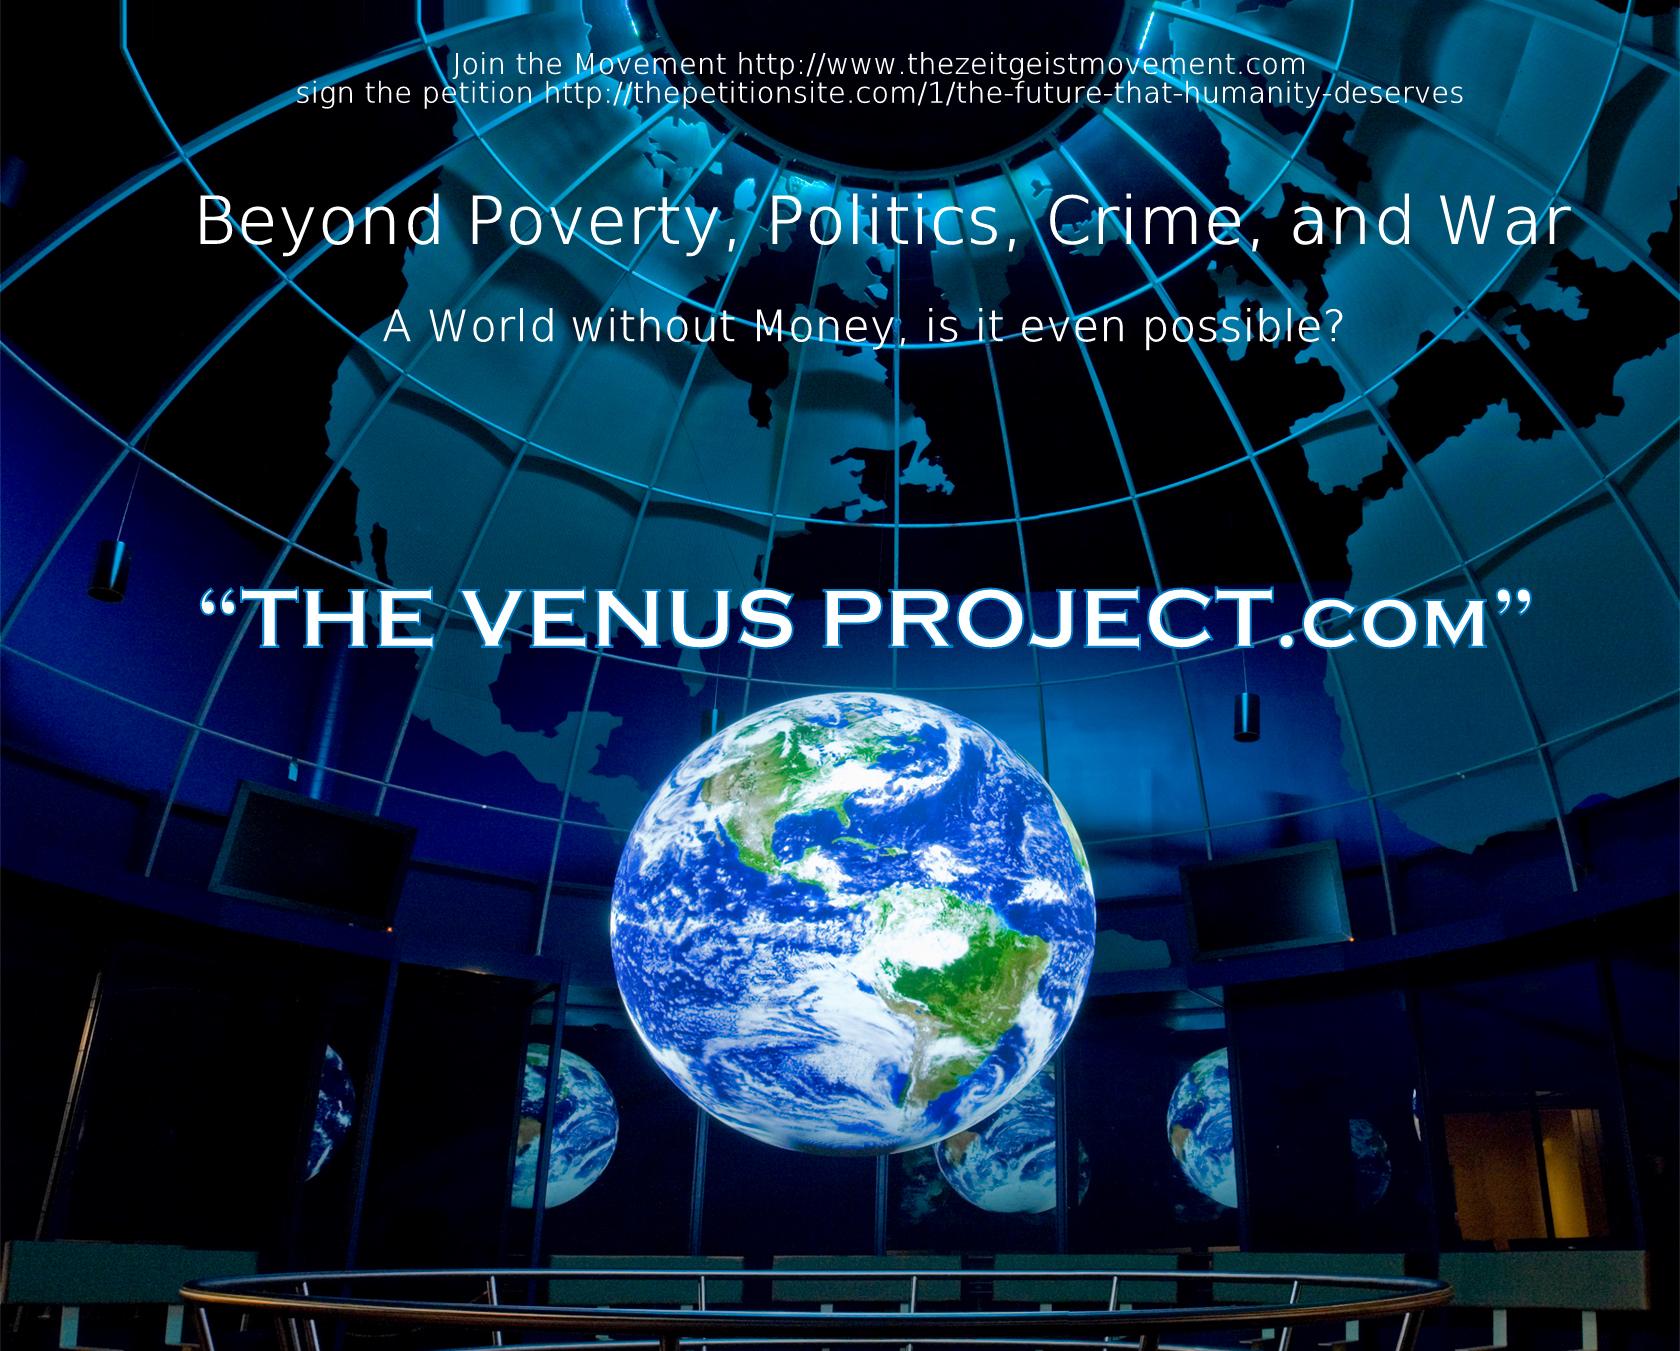 Venus Project